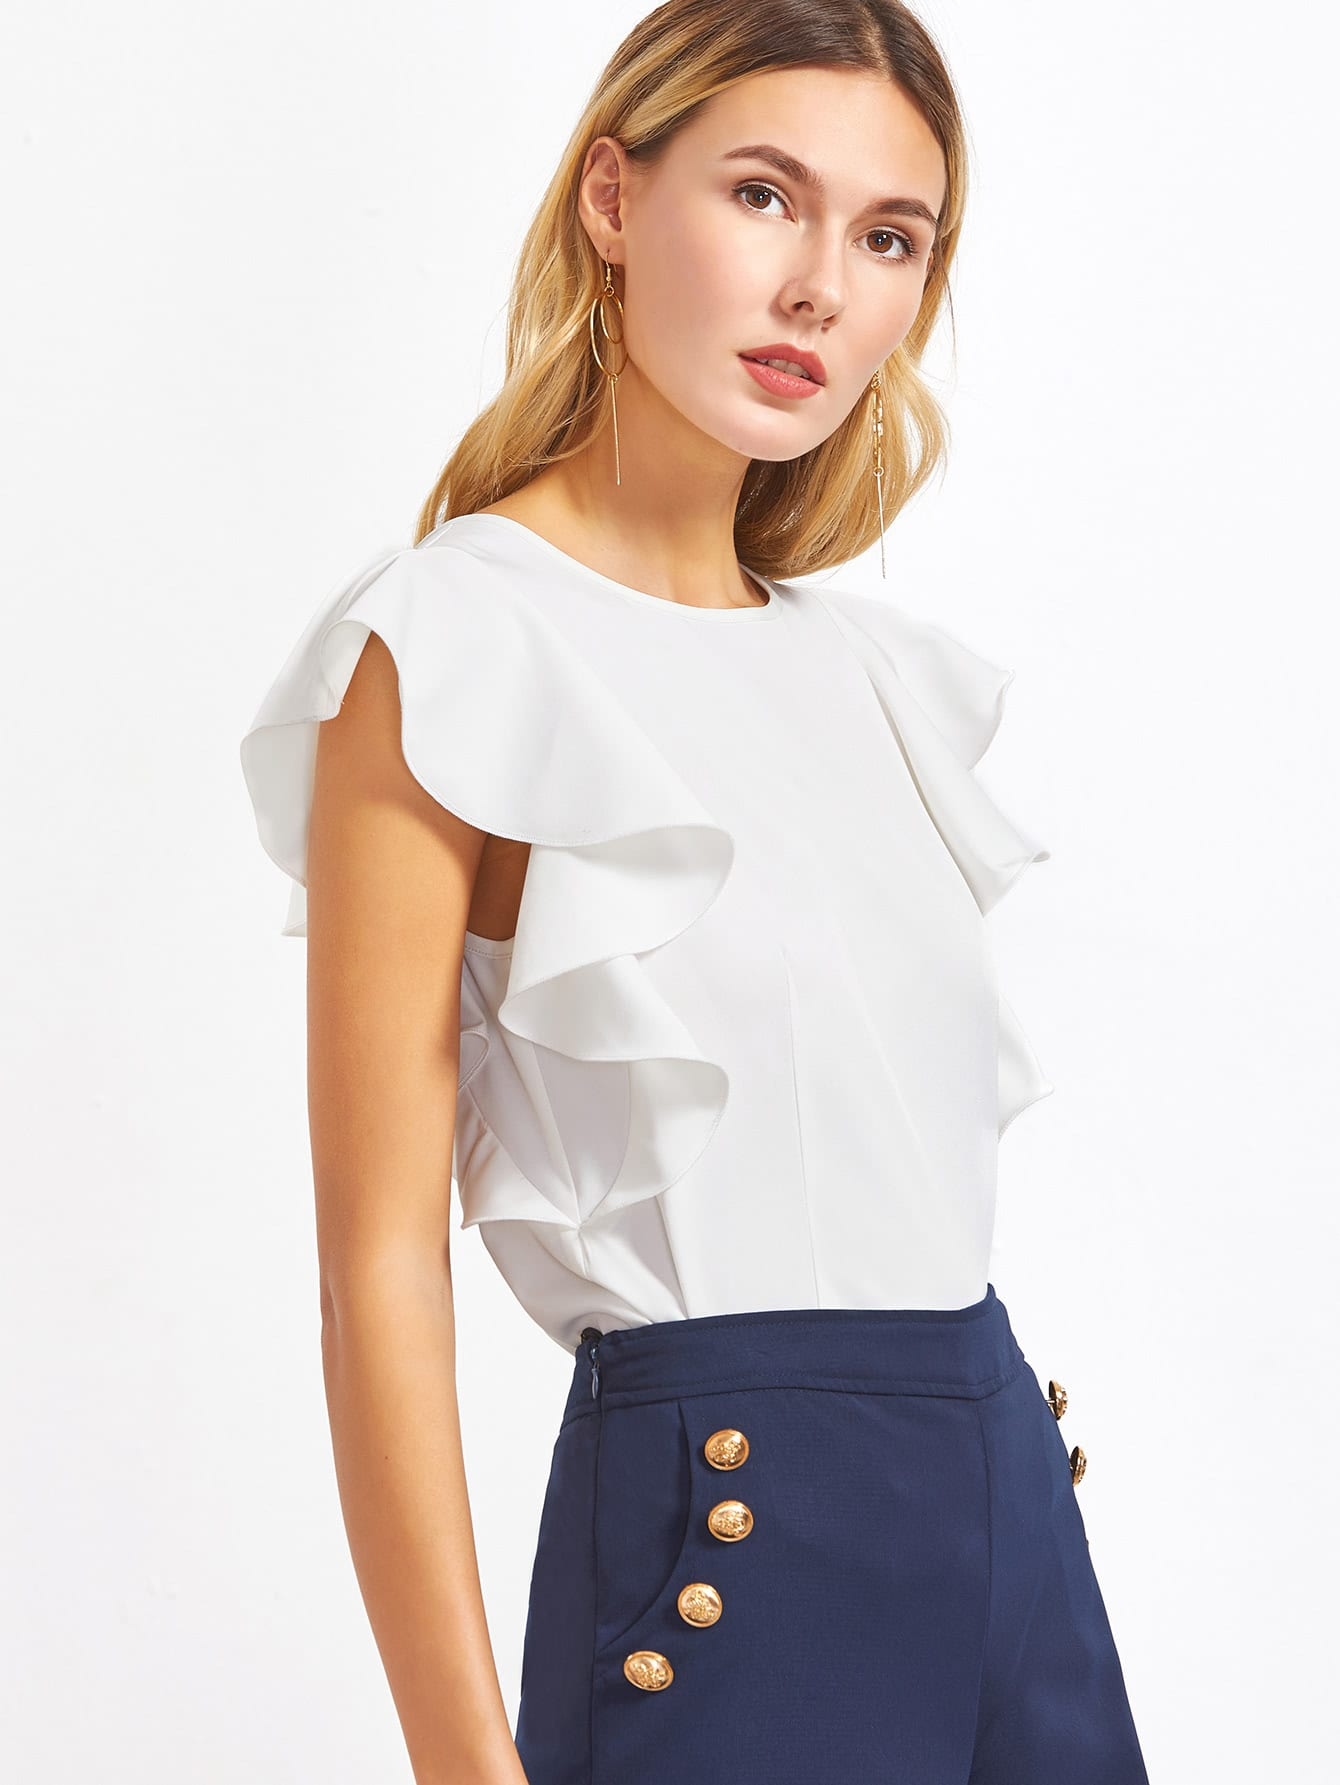 blouse161130722_2